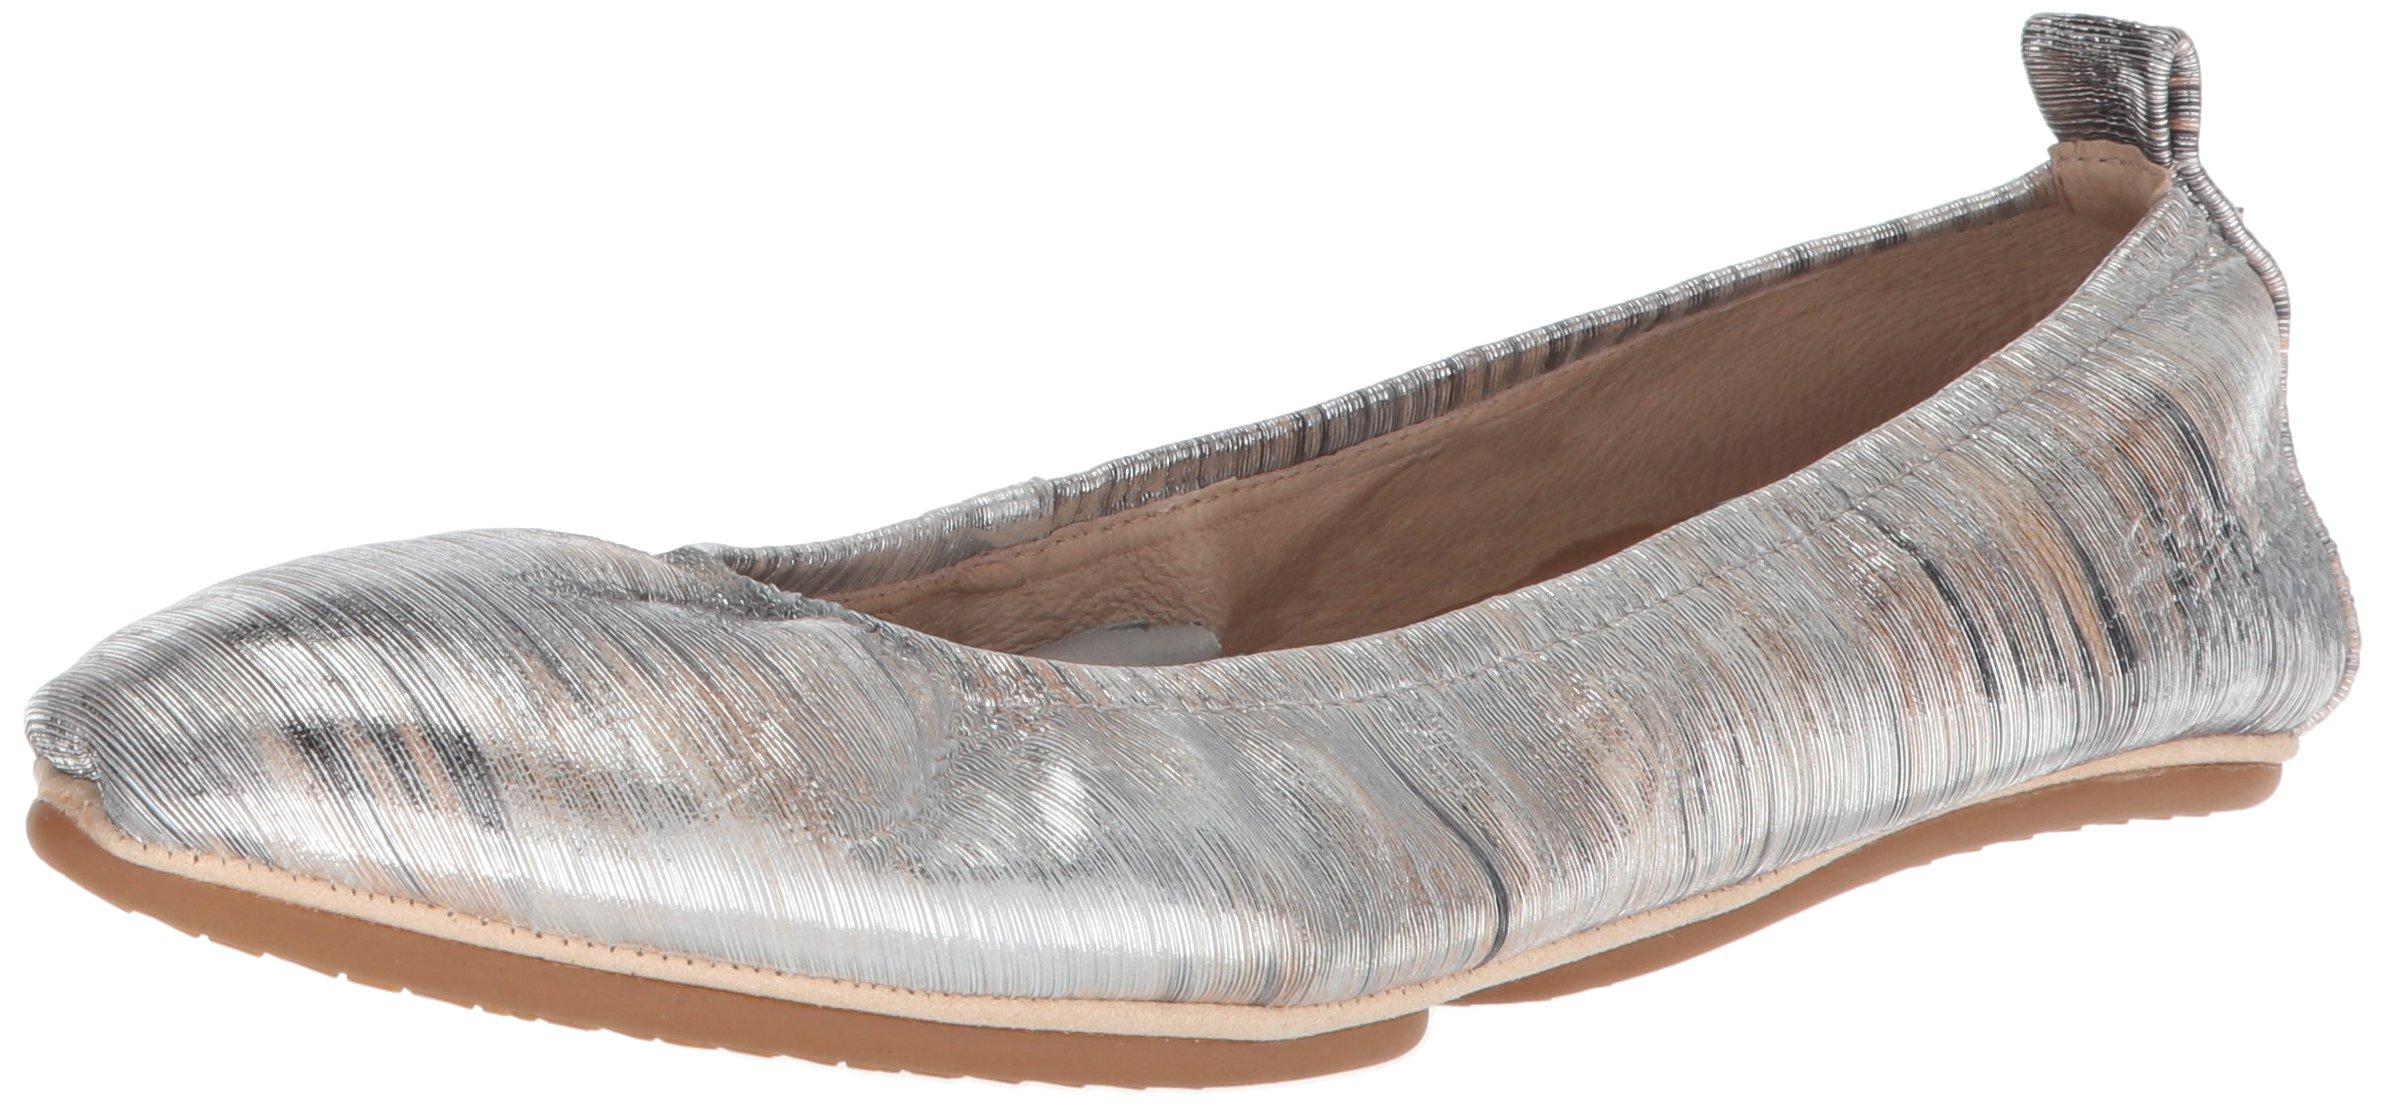 Yosi Samra Women's Vince Ballet Flat, Silver/Metallic Noise Leather, 11 Medium US